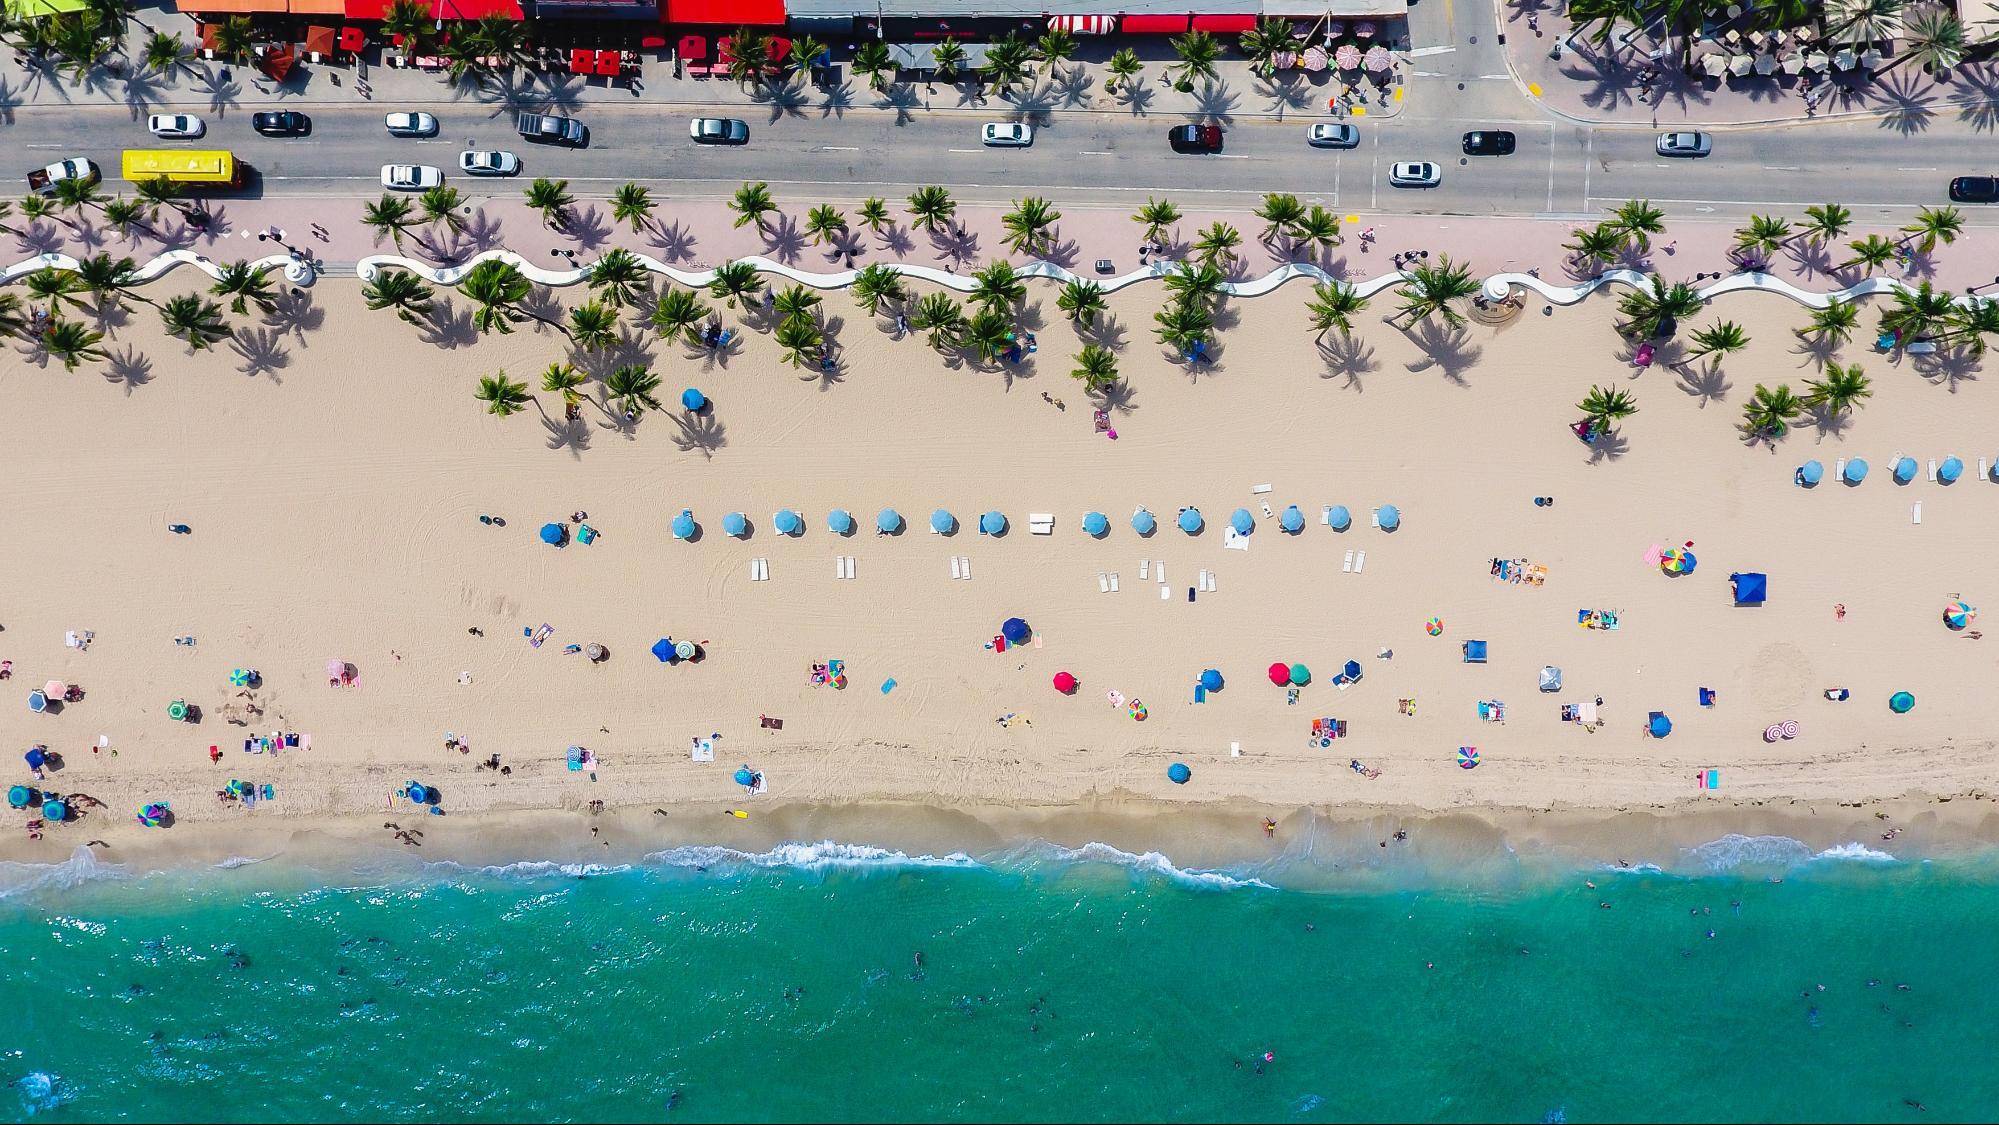 Beach view of St. Petersburg, Florida